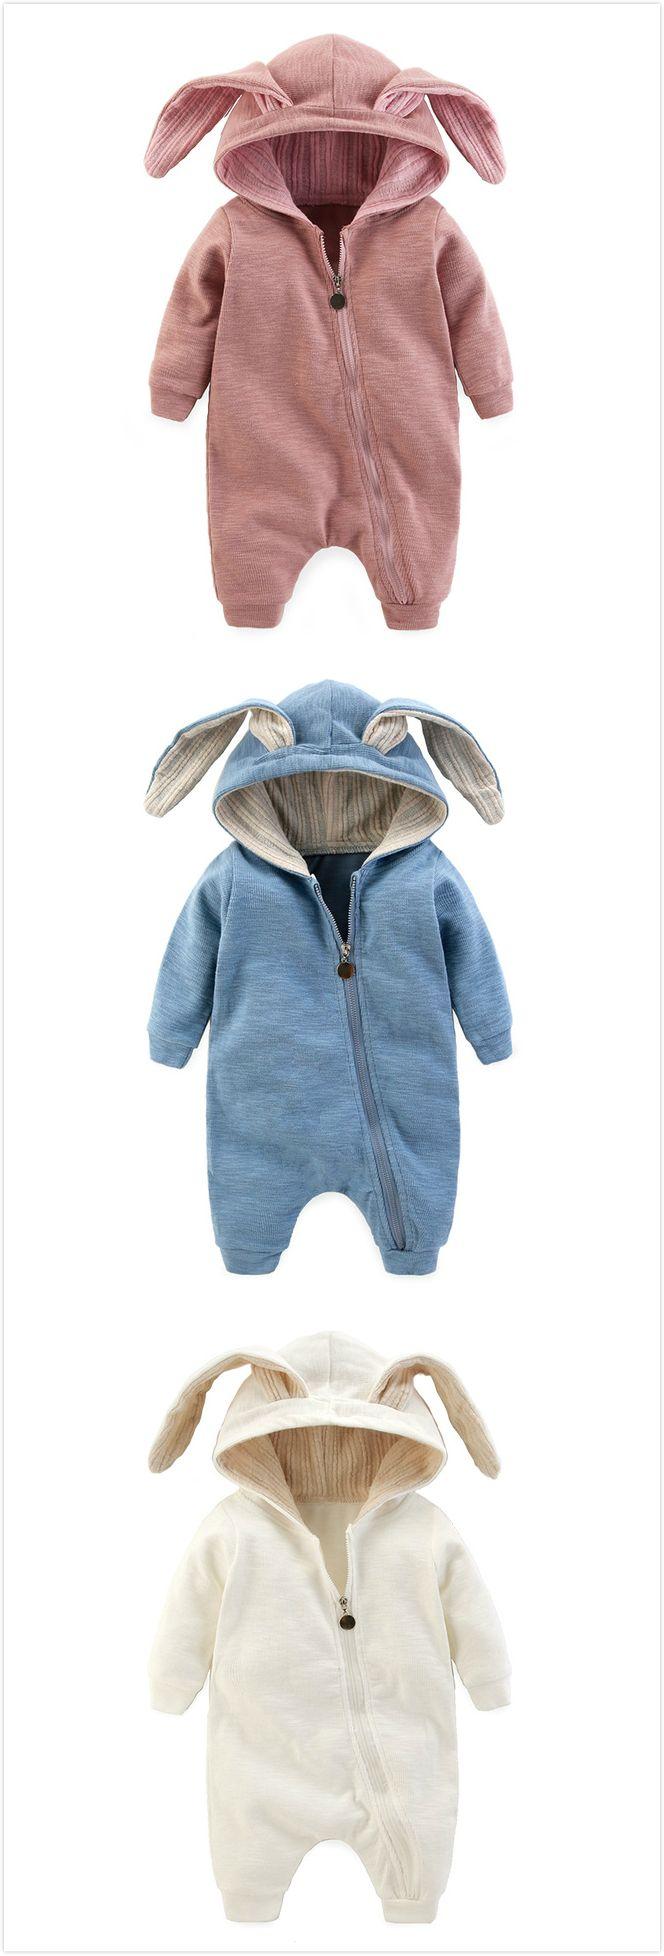 Unisex Baby boy girl jumpsuit  infant toddler hooded romper for autumn winter